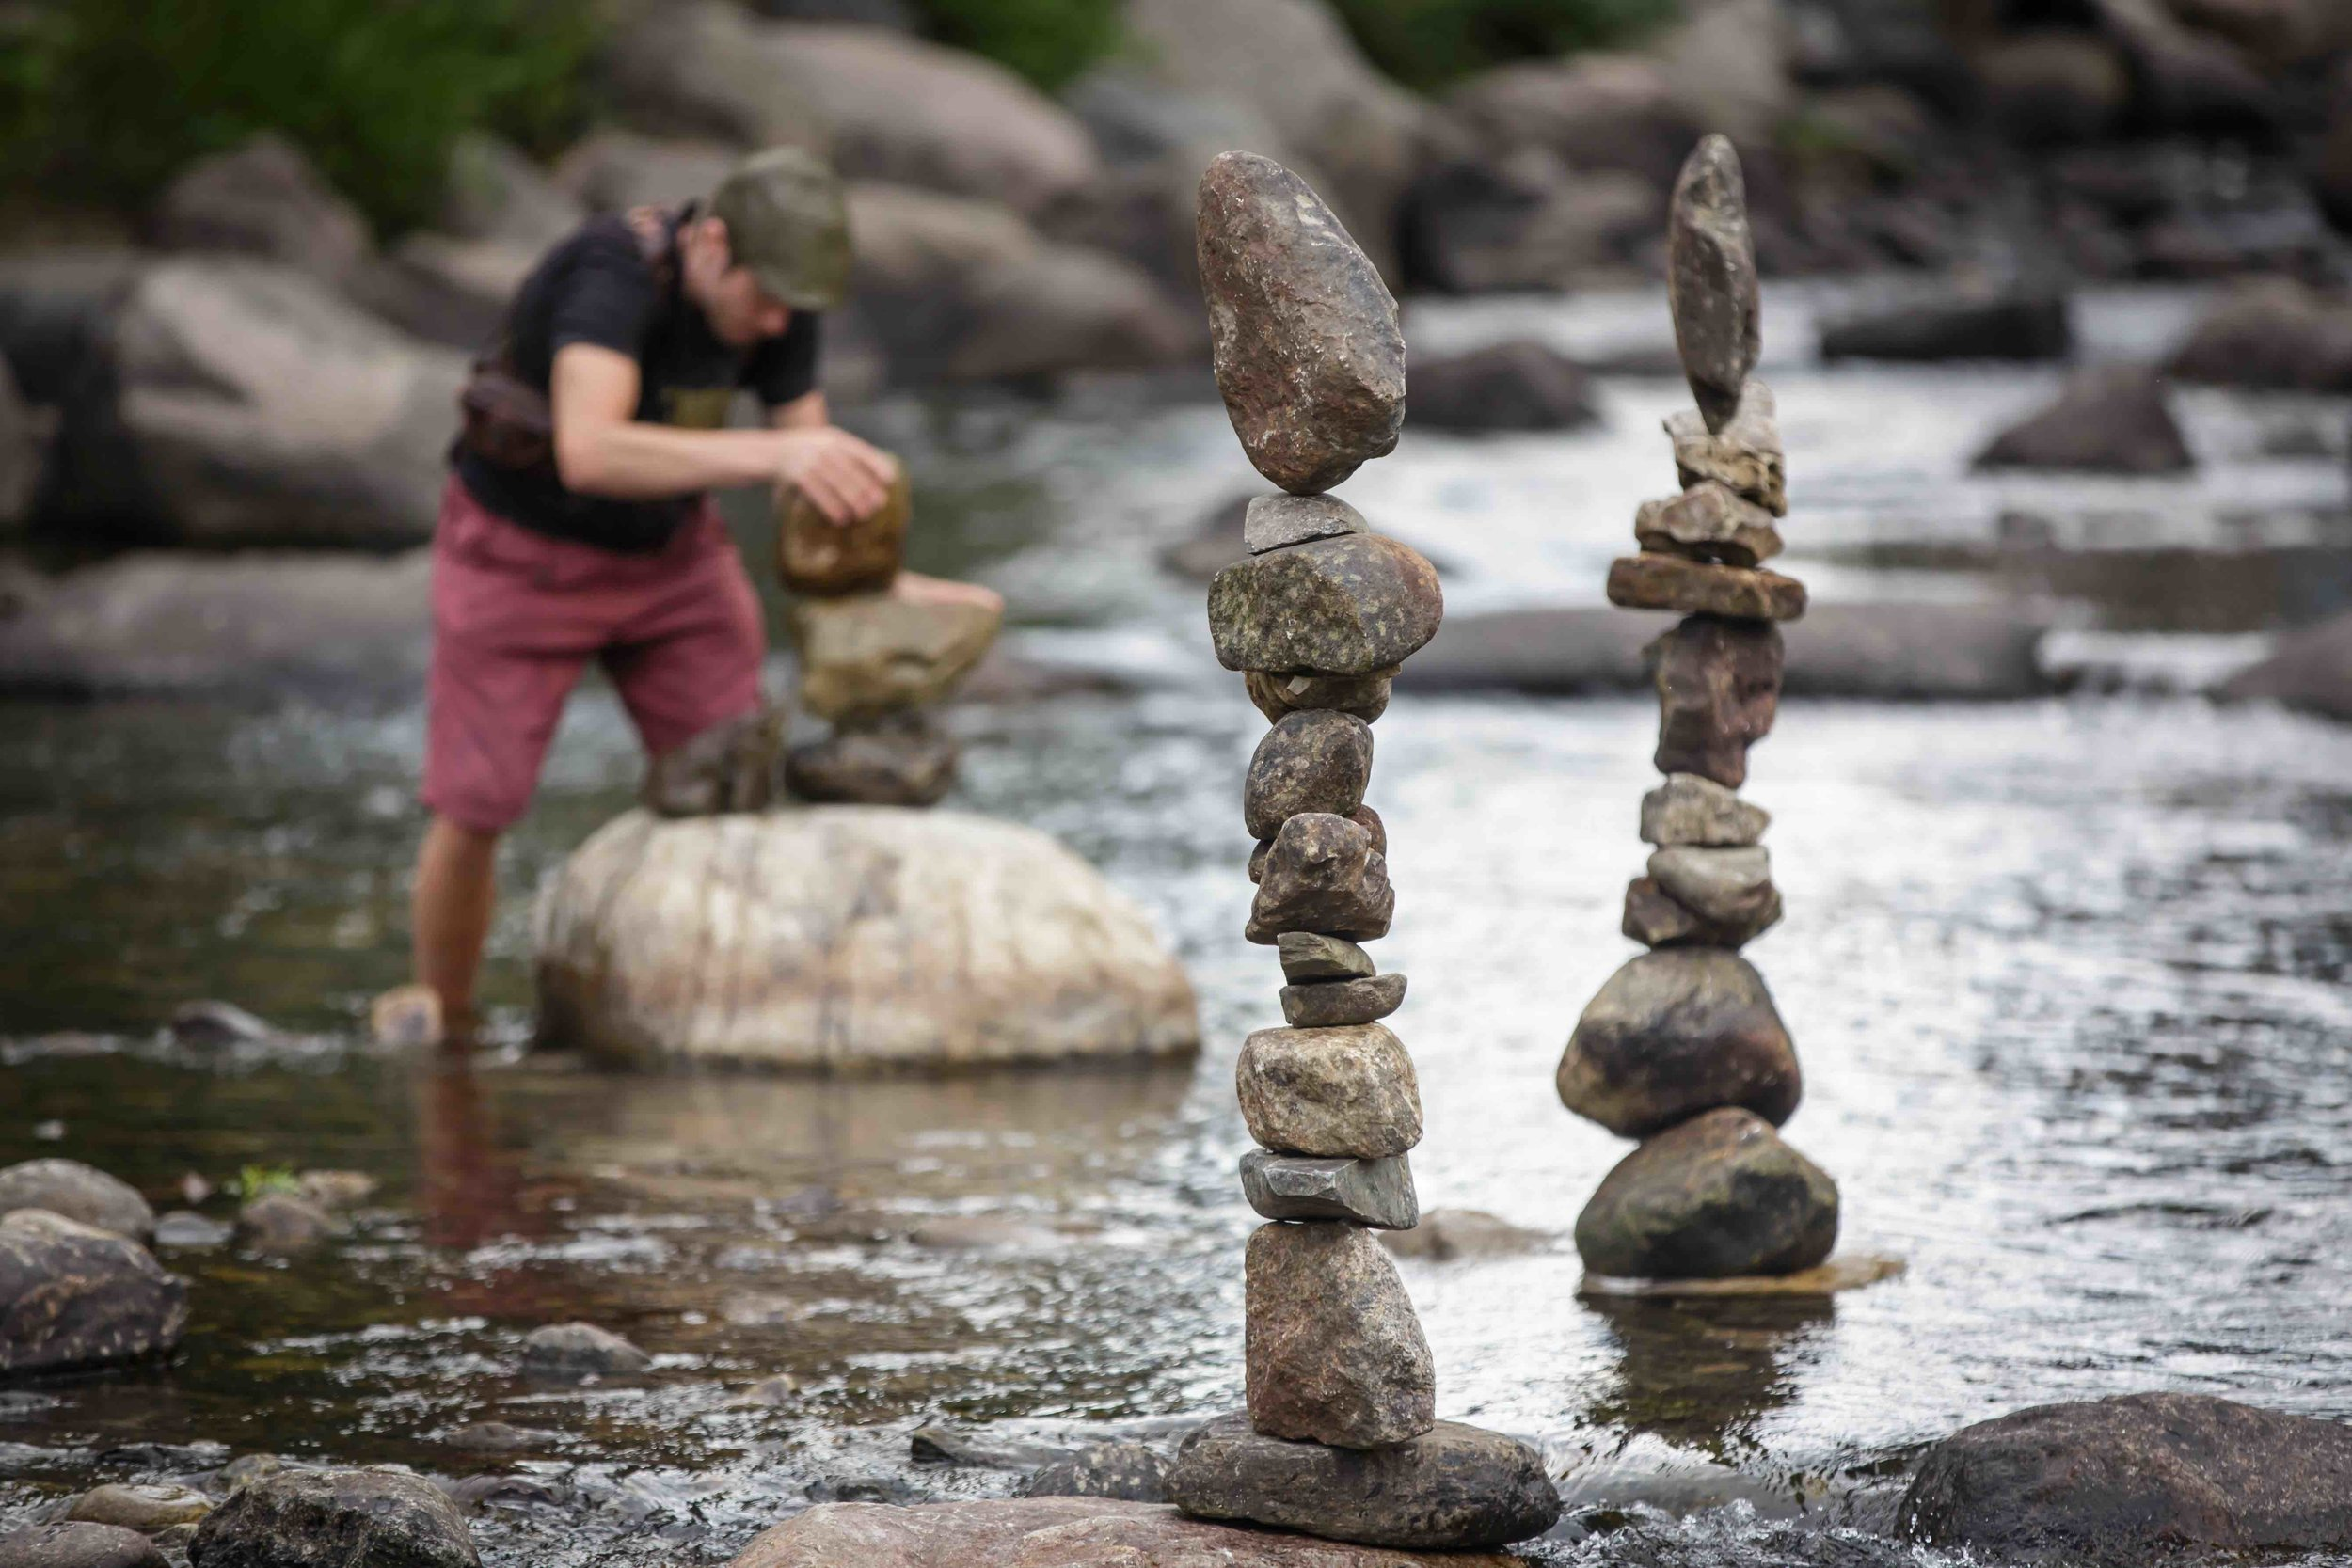 balanced rock sculptures - By Michael Grab | Breckenridge 2018